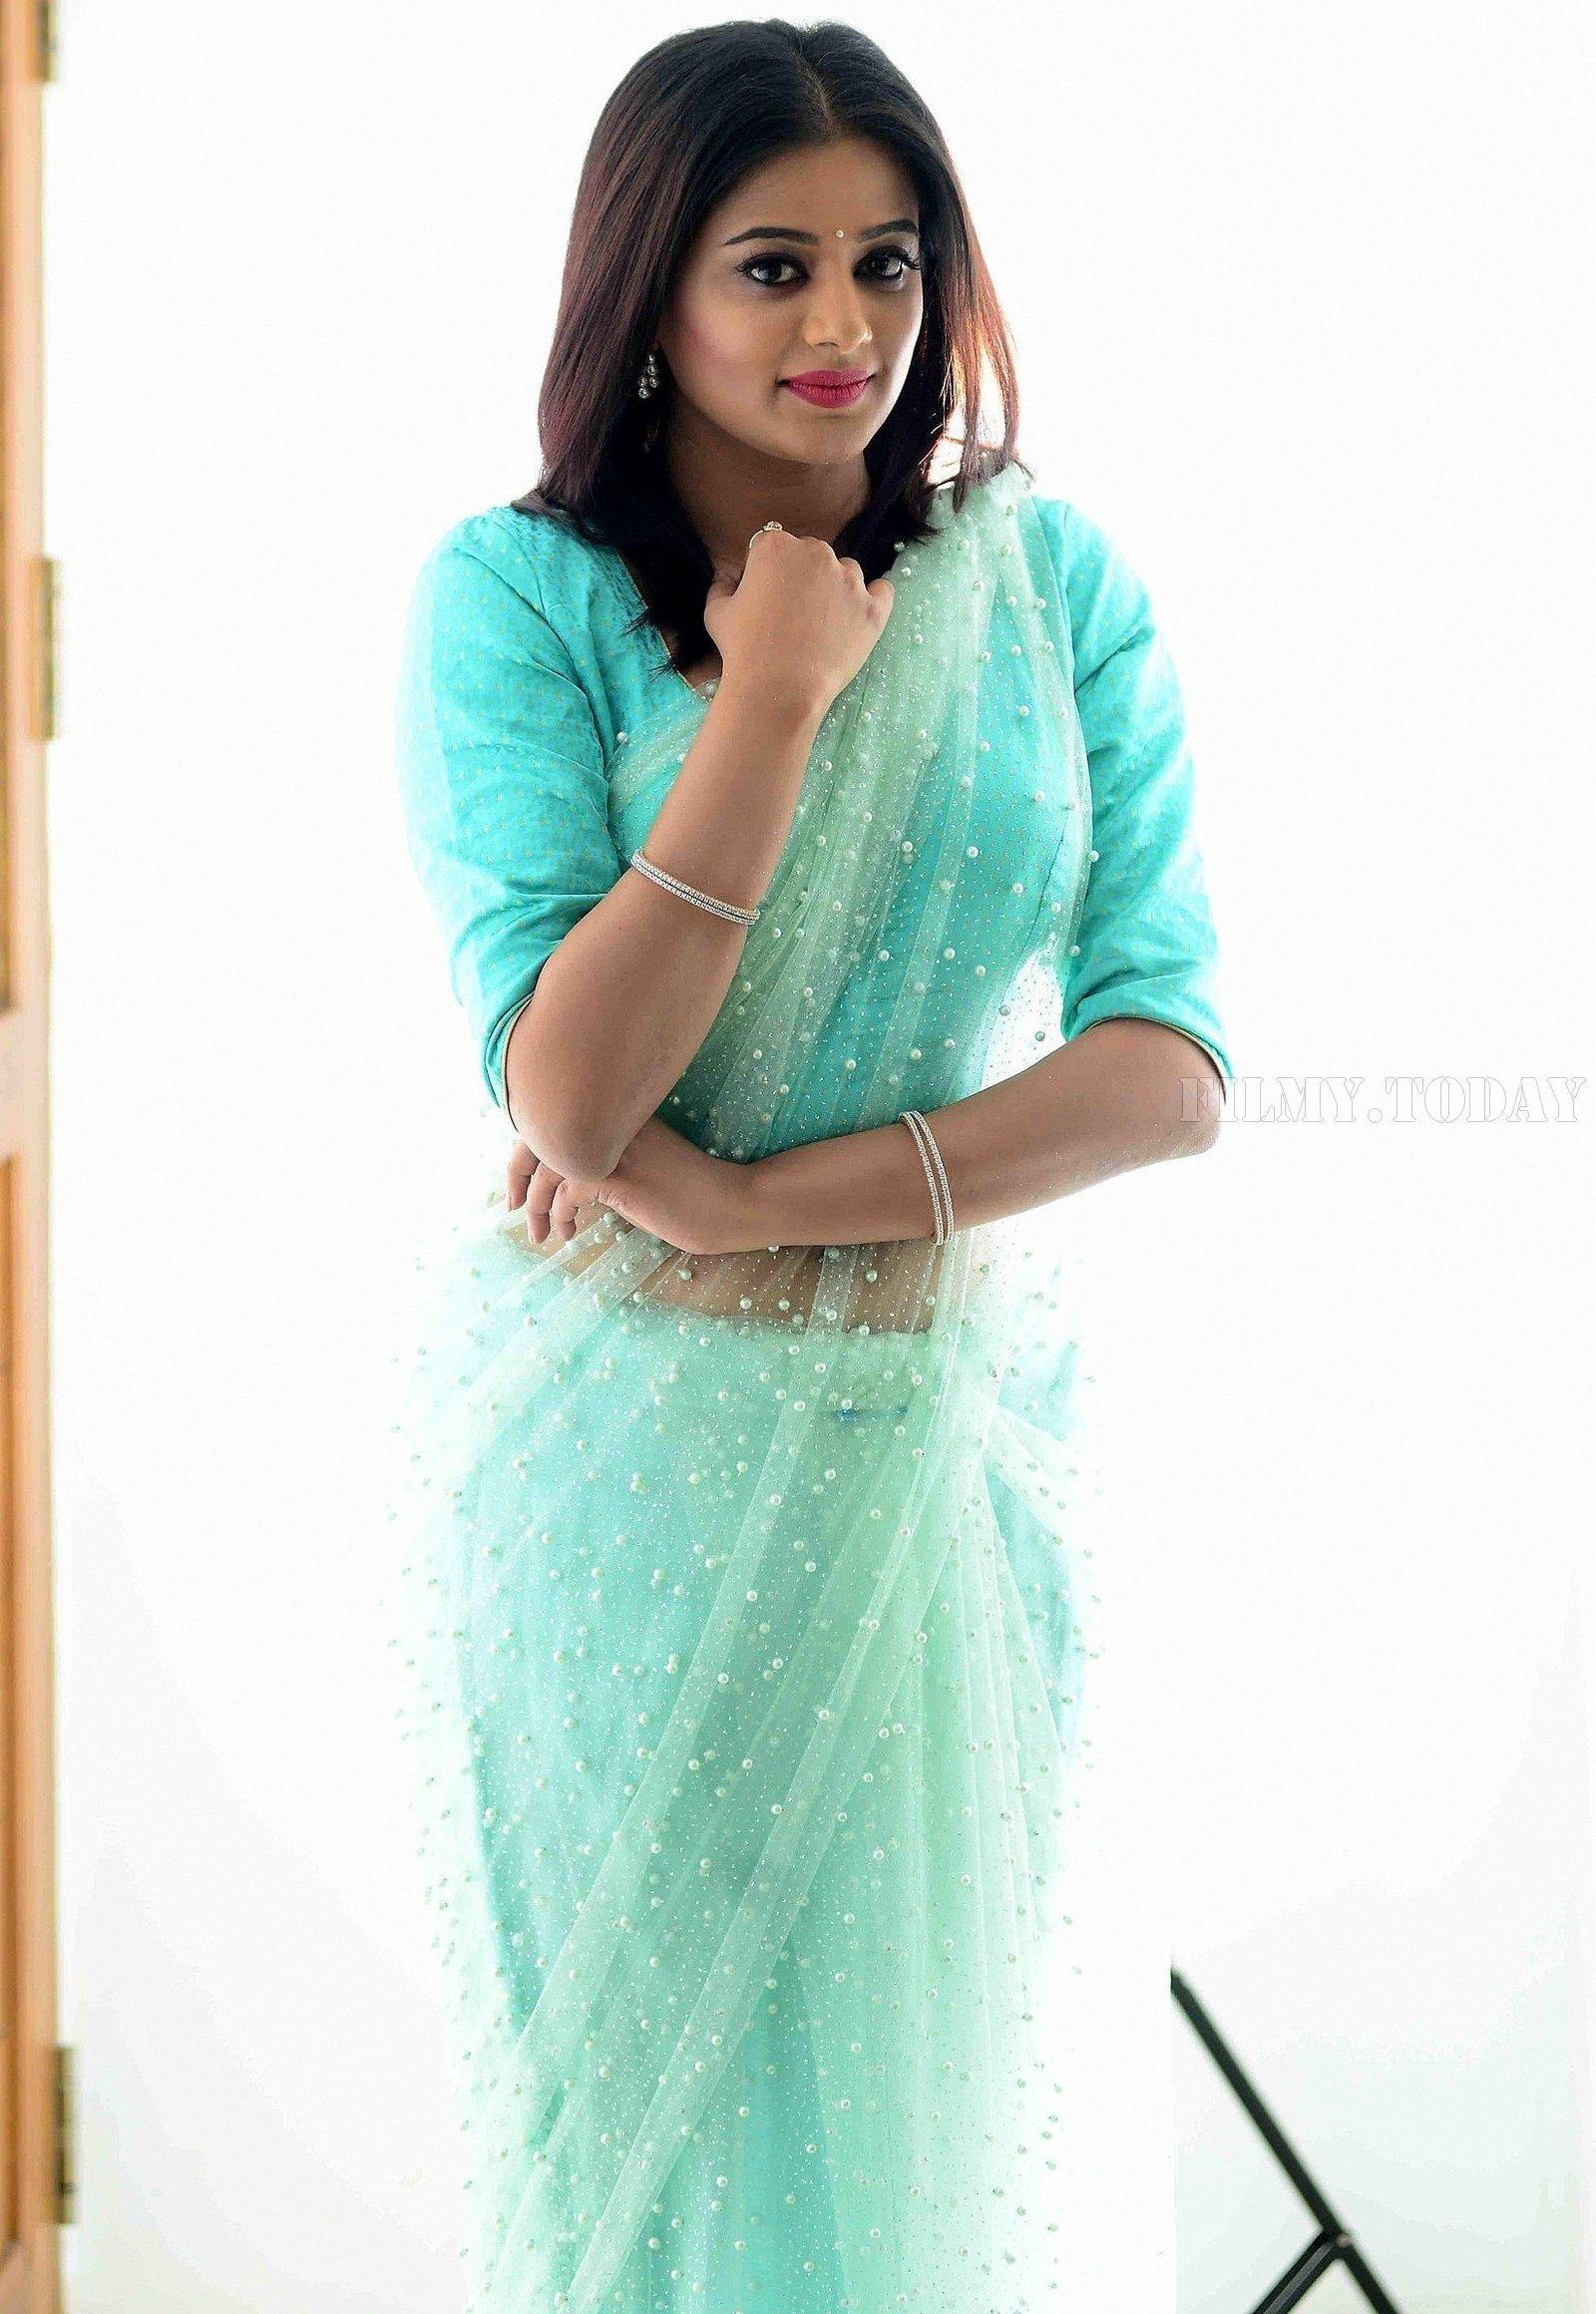 Actress Priya Mani Hot in Transparent Saree Photoshoot | Picture 1528083